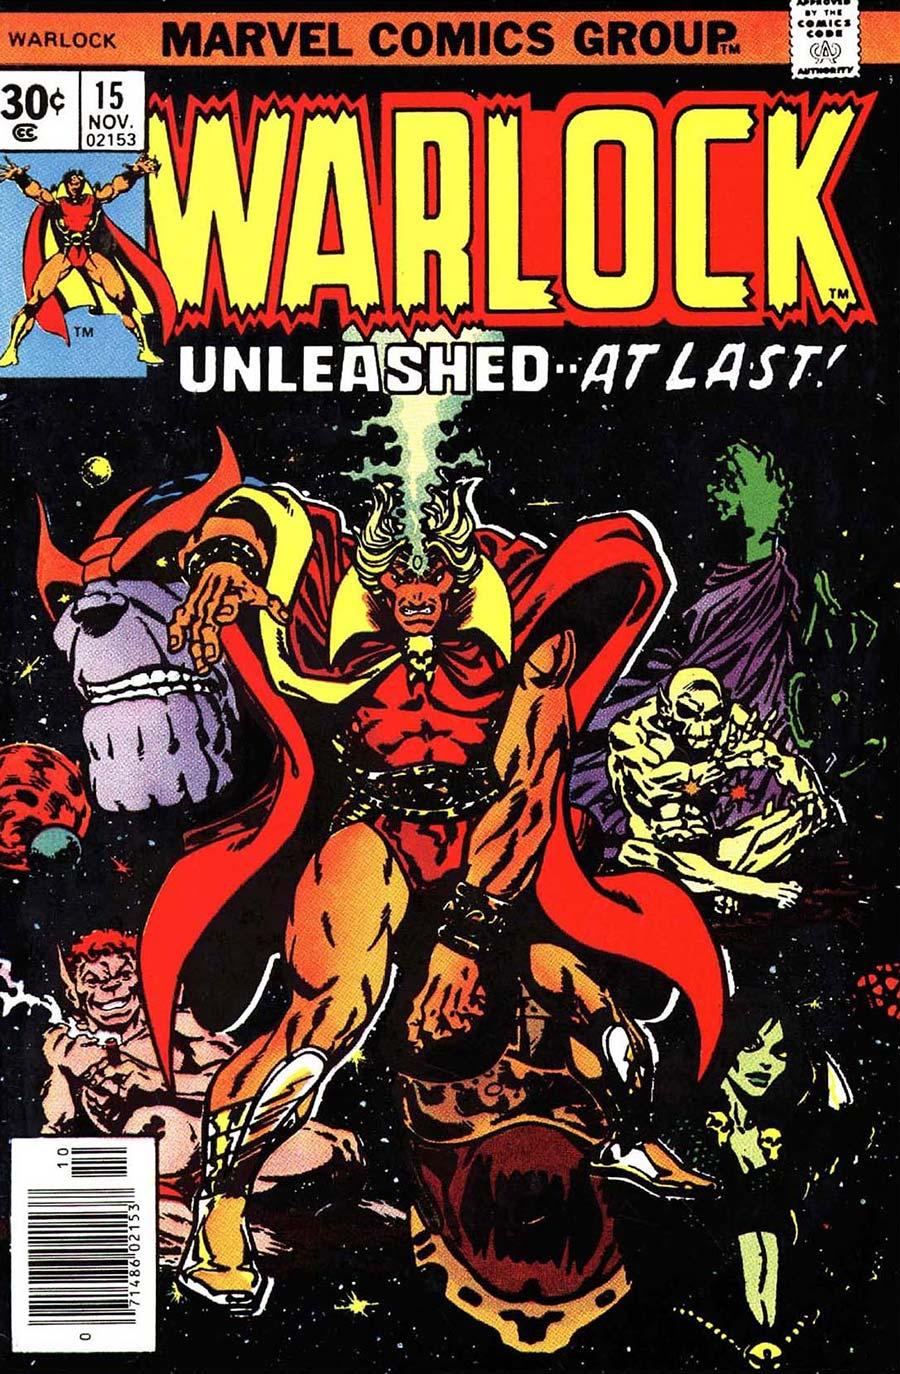 Warlock (Jim Starlin)